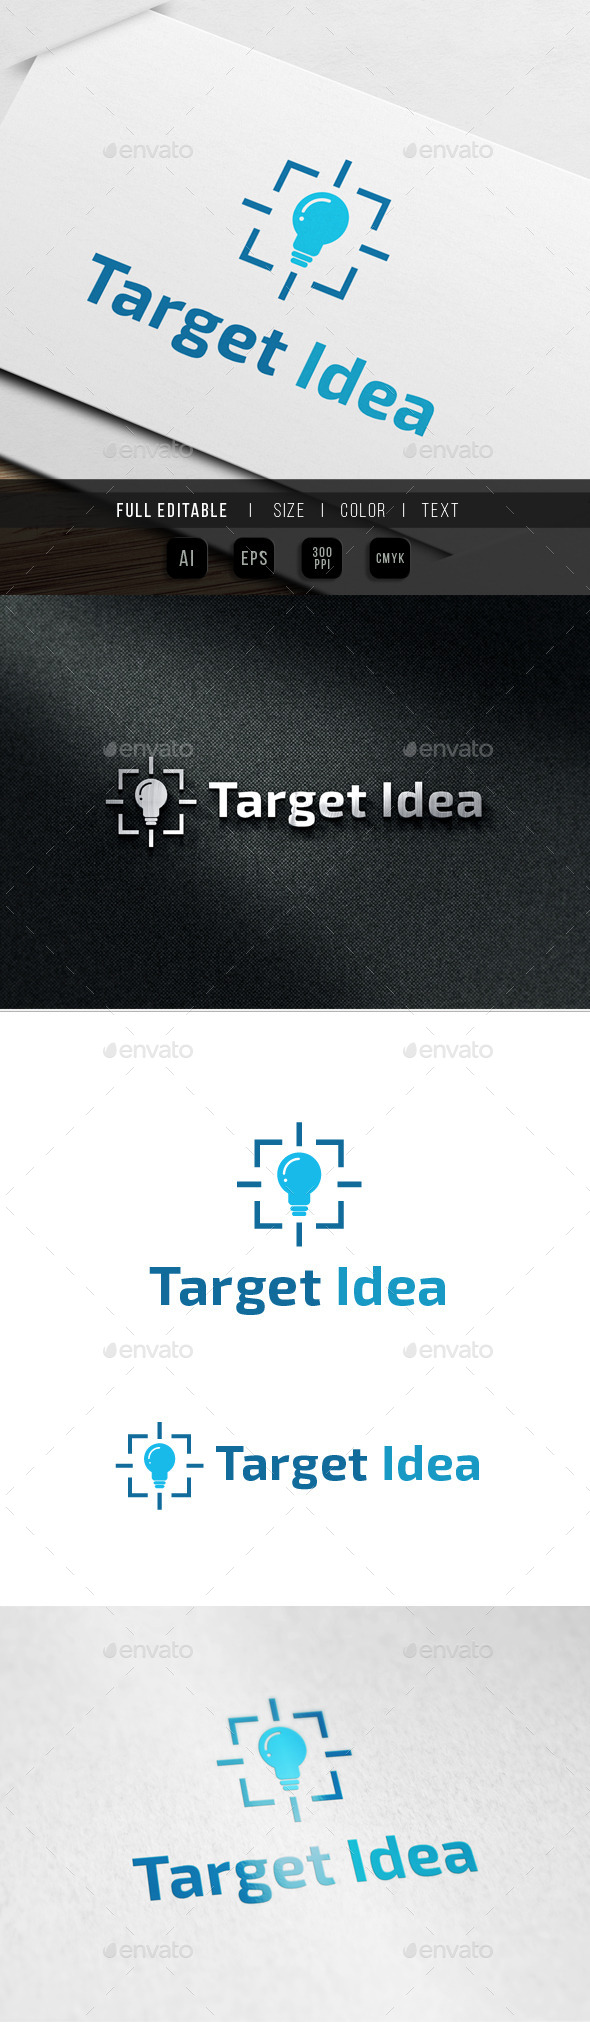 Target Photo - Abstract Logo Templates